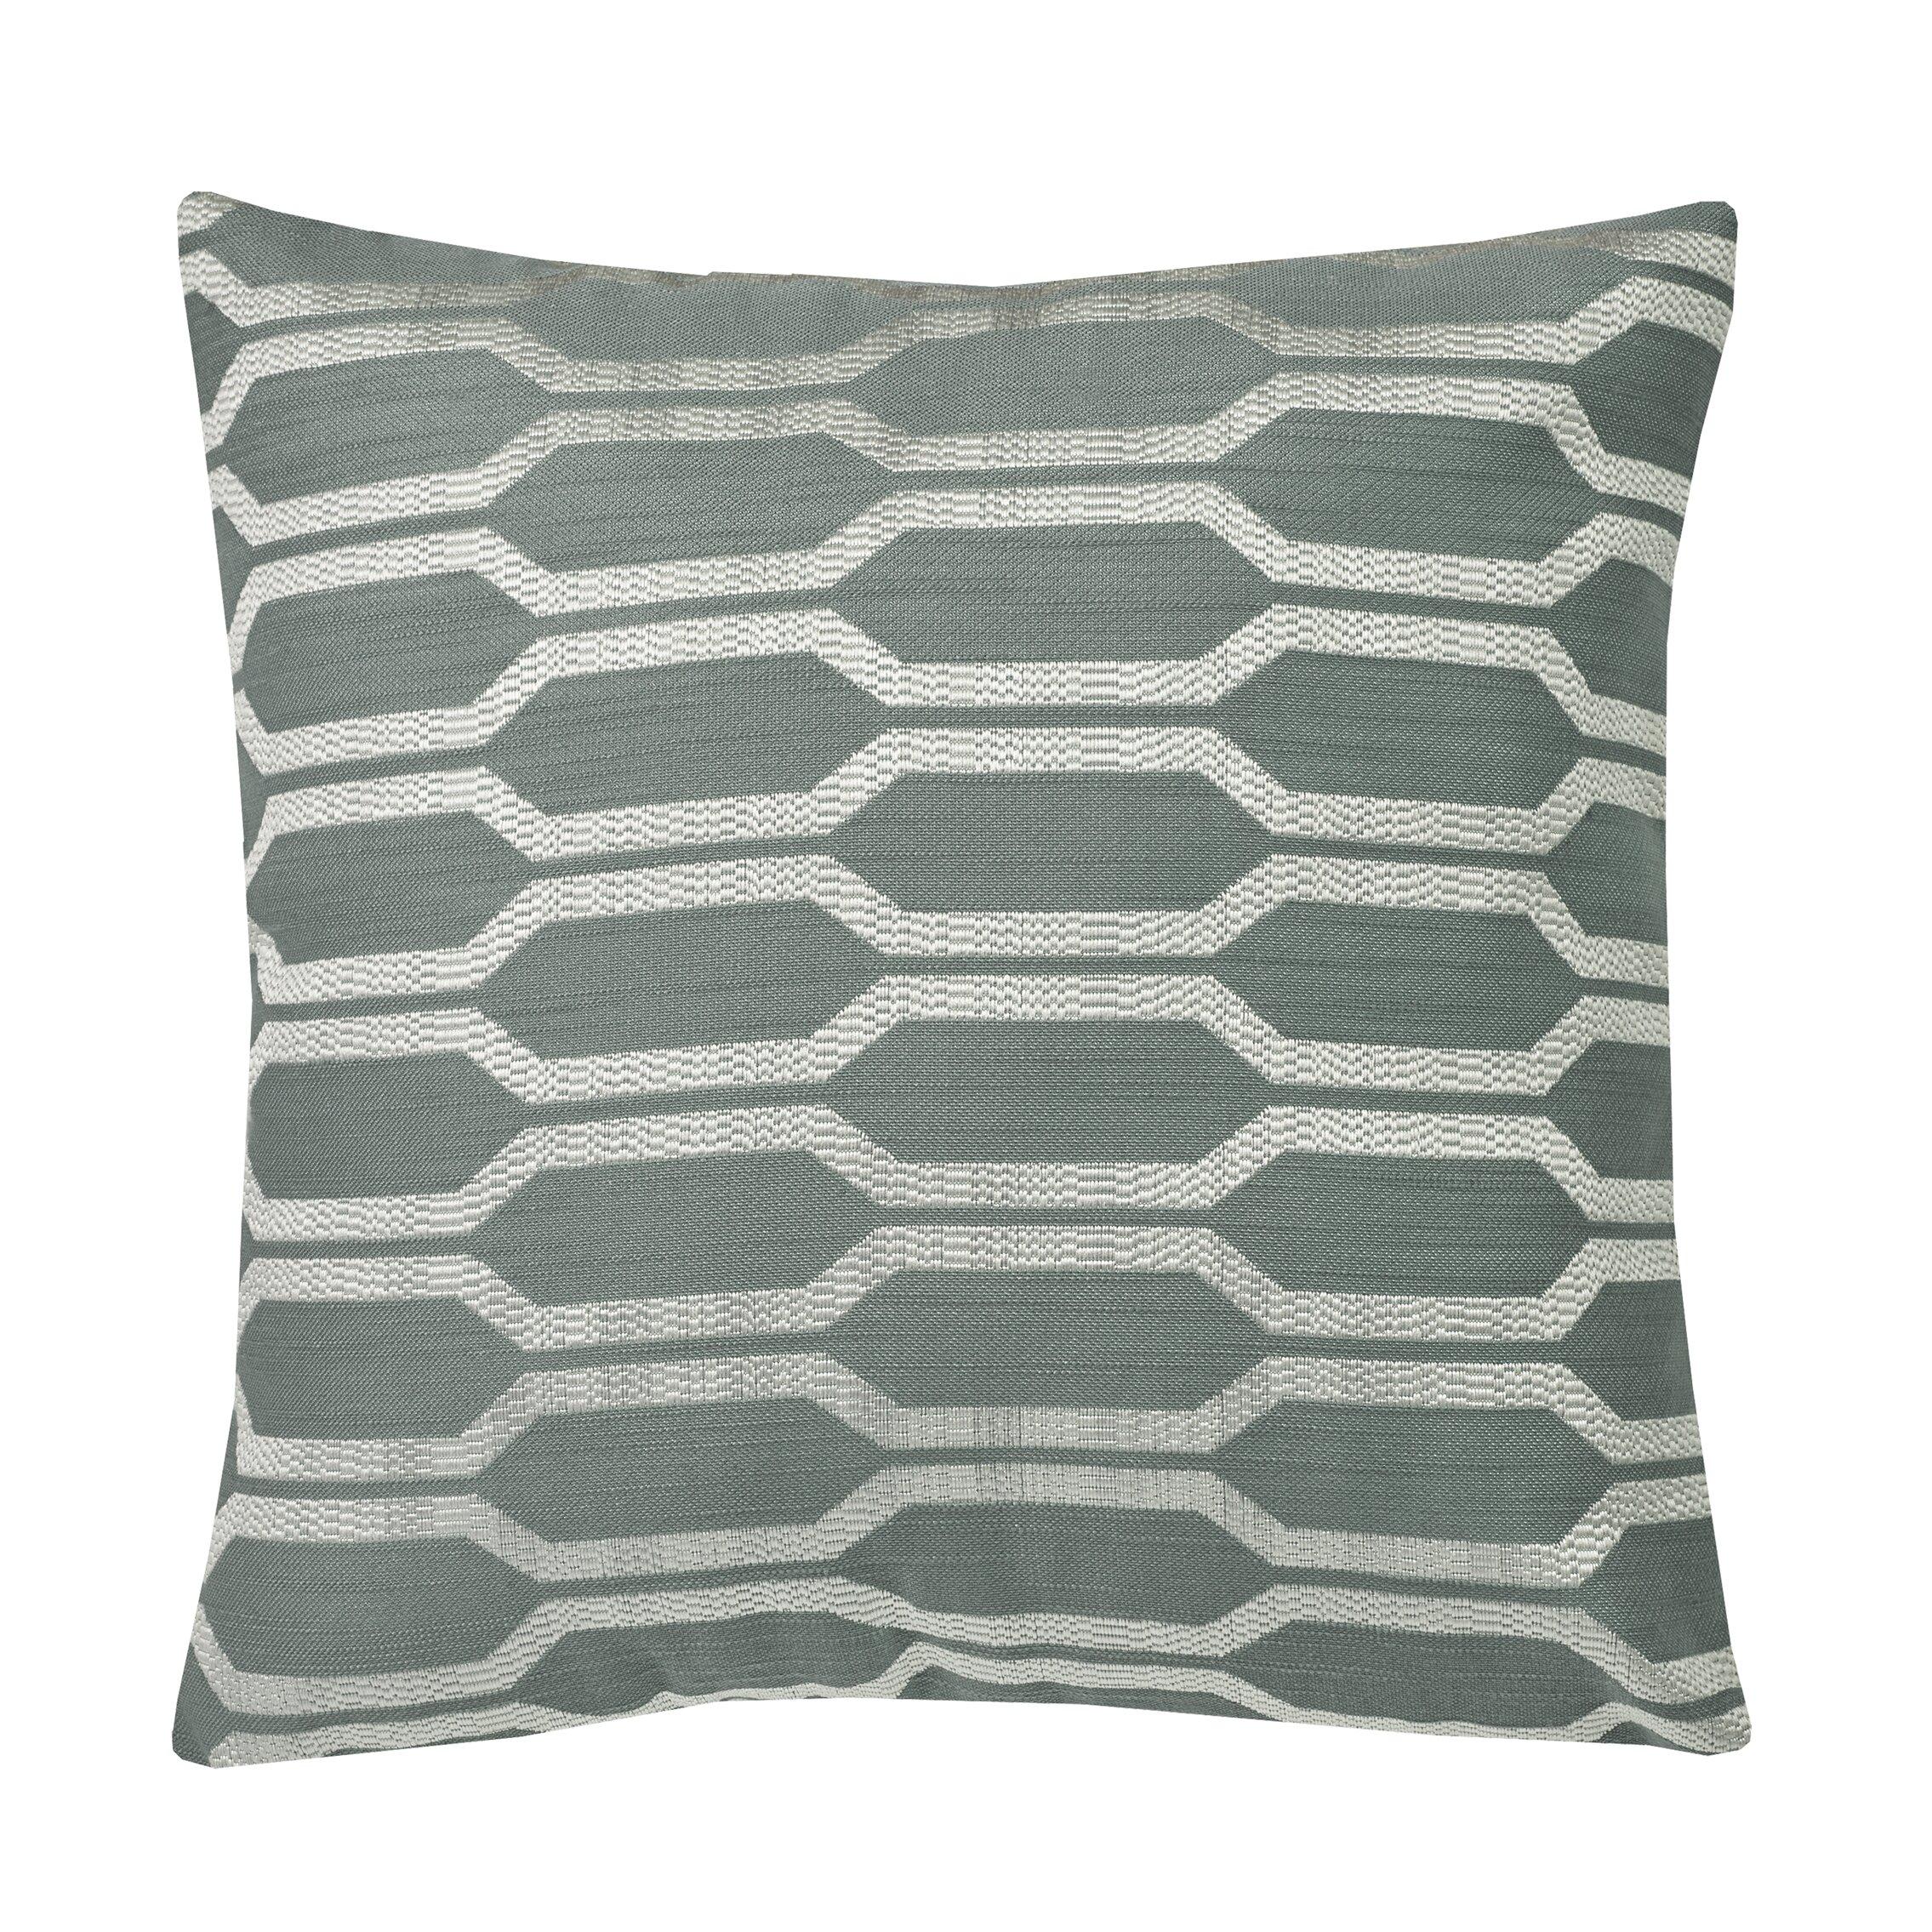 Westex Urban Loft Hexagon Throw Pillow & Reviews | Wayfair - Westex Urban Loft Hexagon Throw Pillow